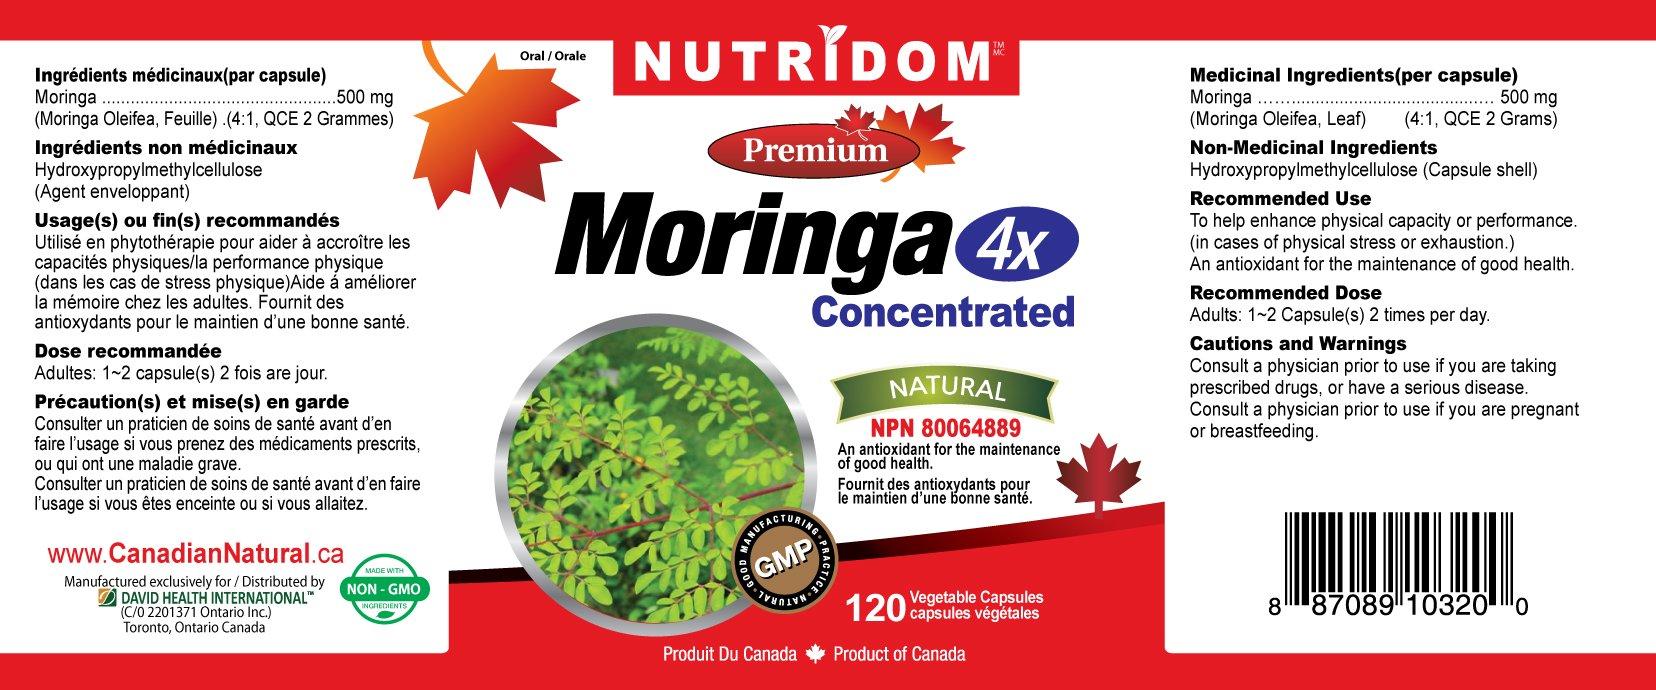 NUTRIDOM Moringa 4X 500 mg 120 Vcaps